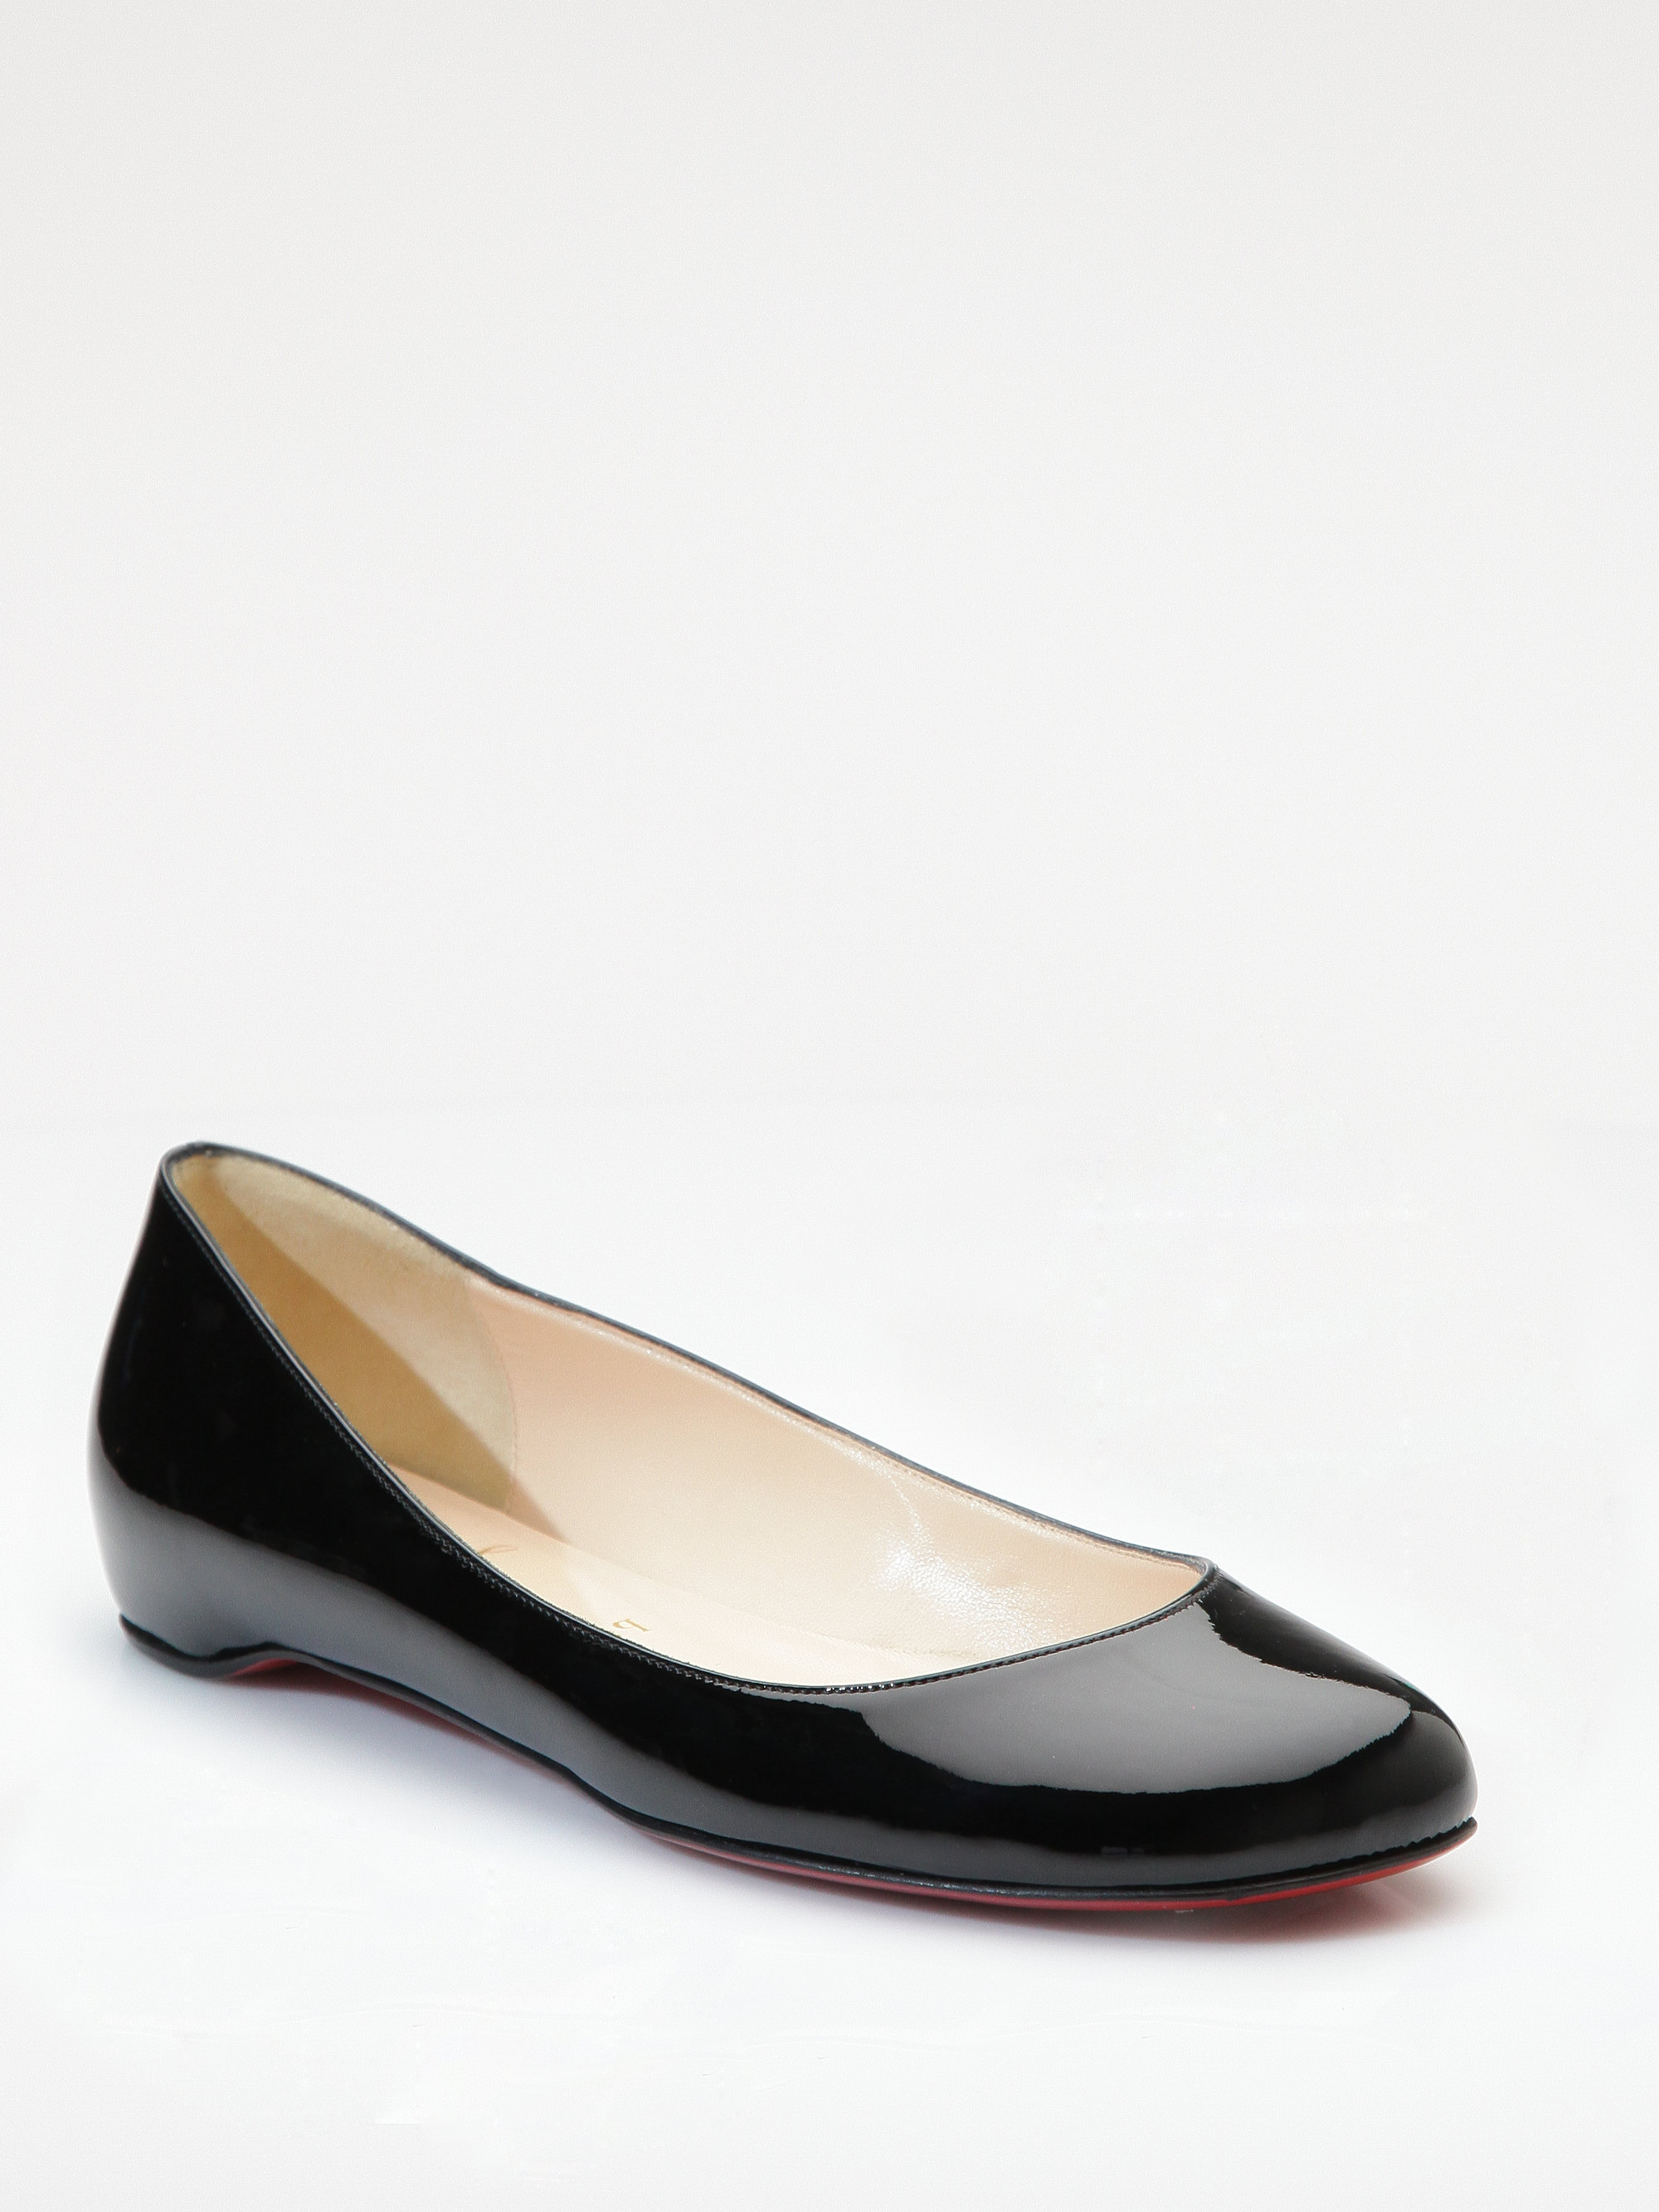 18356ca1edf0 ... sale lyst christian louboutin kobe patent leather flats in black e51f3  a89d5